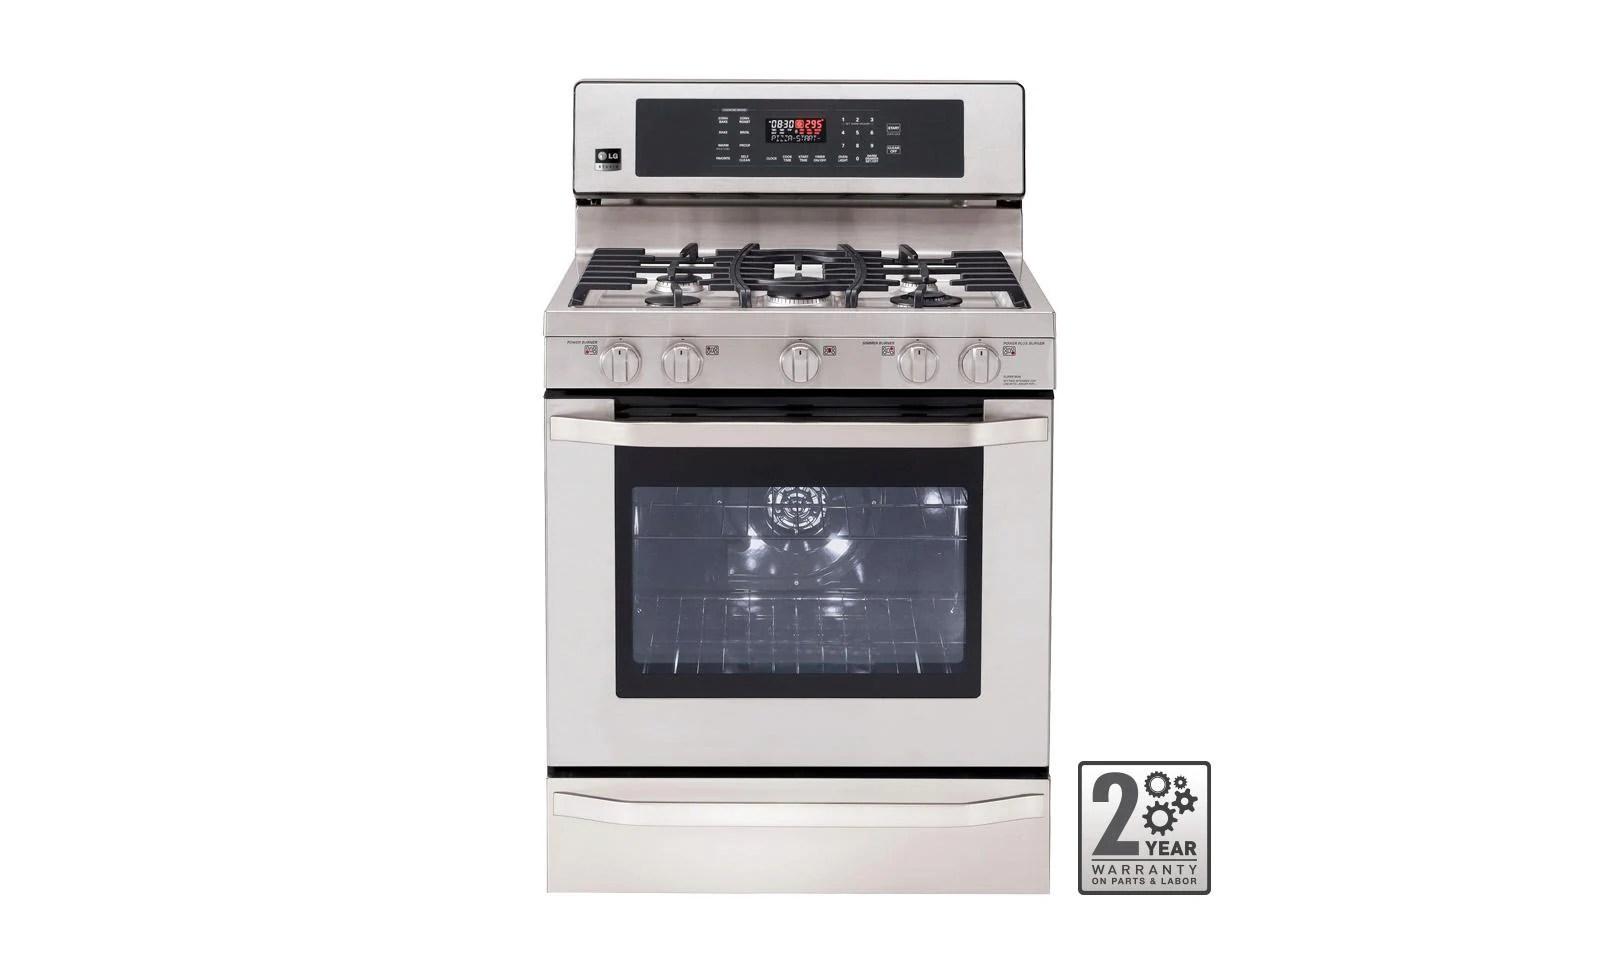 lg kitchen appliances ladders lsrg309st studio gas single oven range with